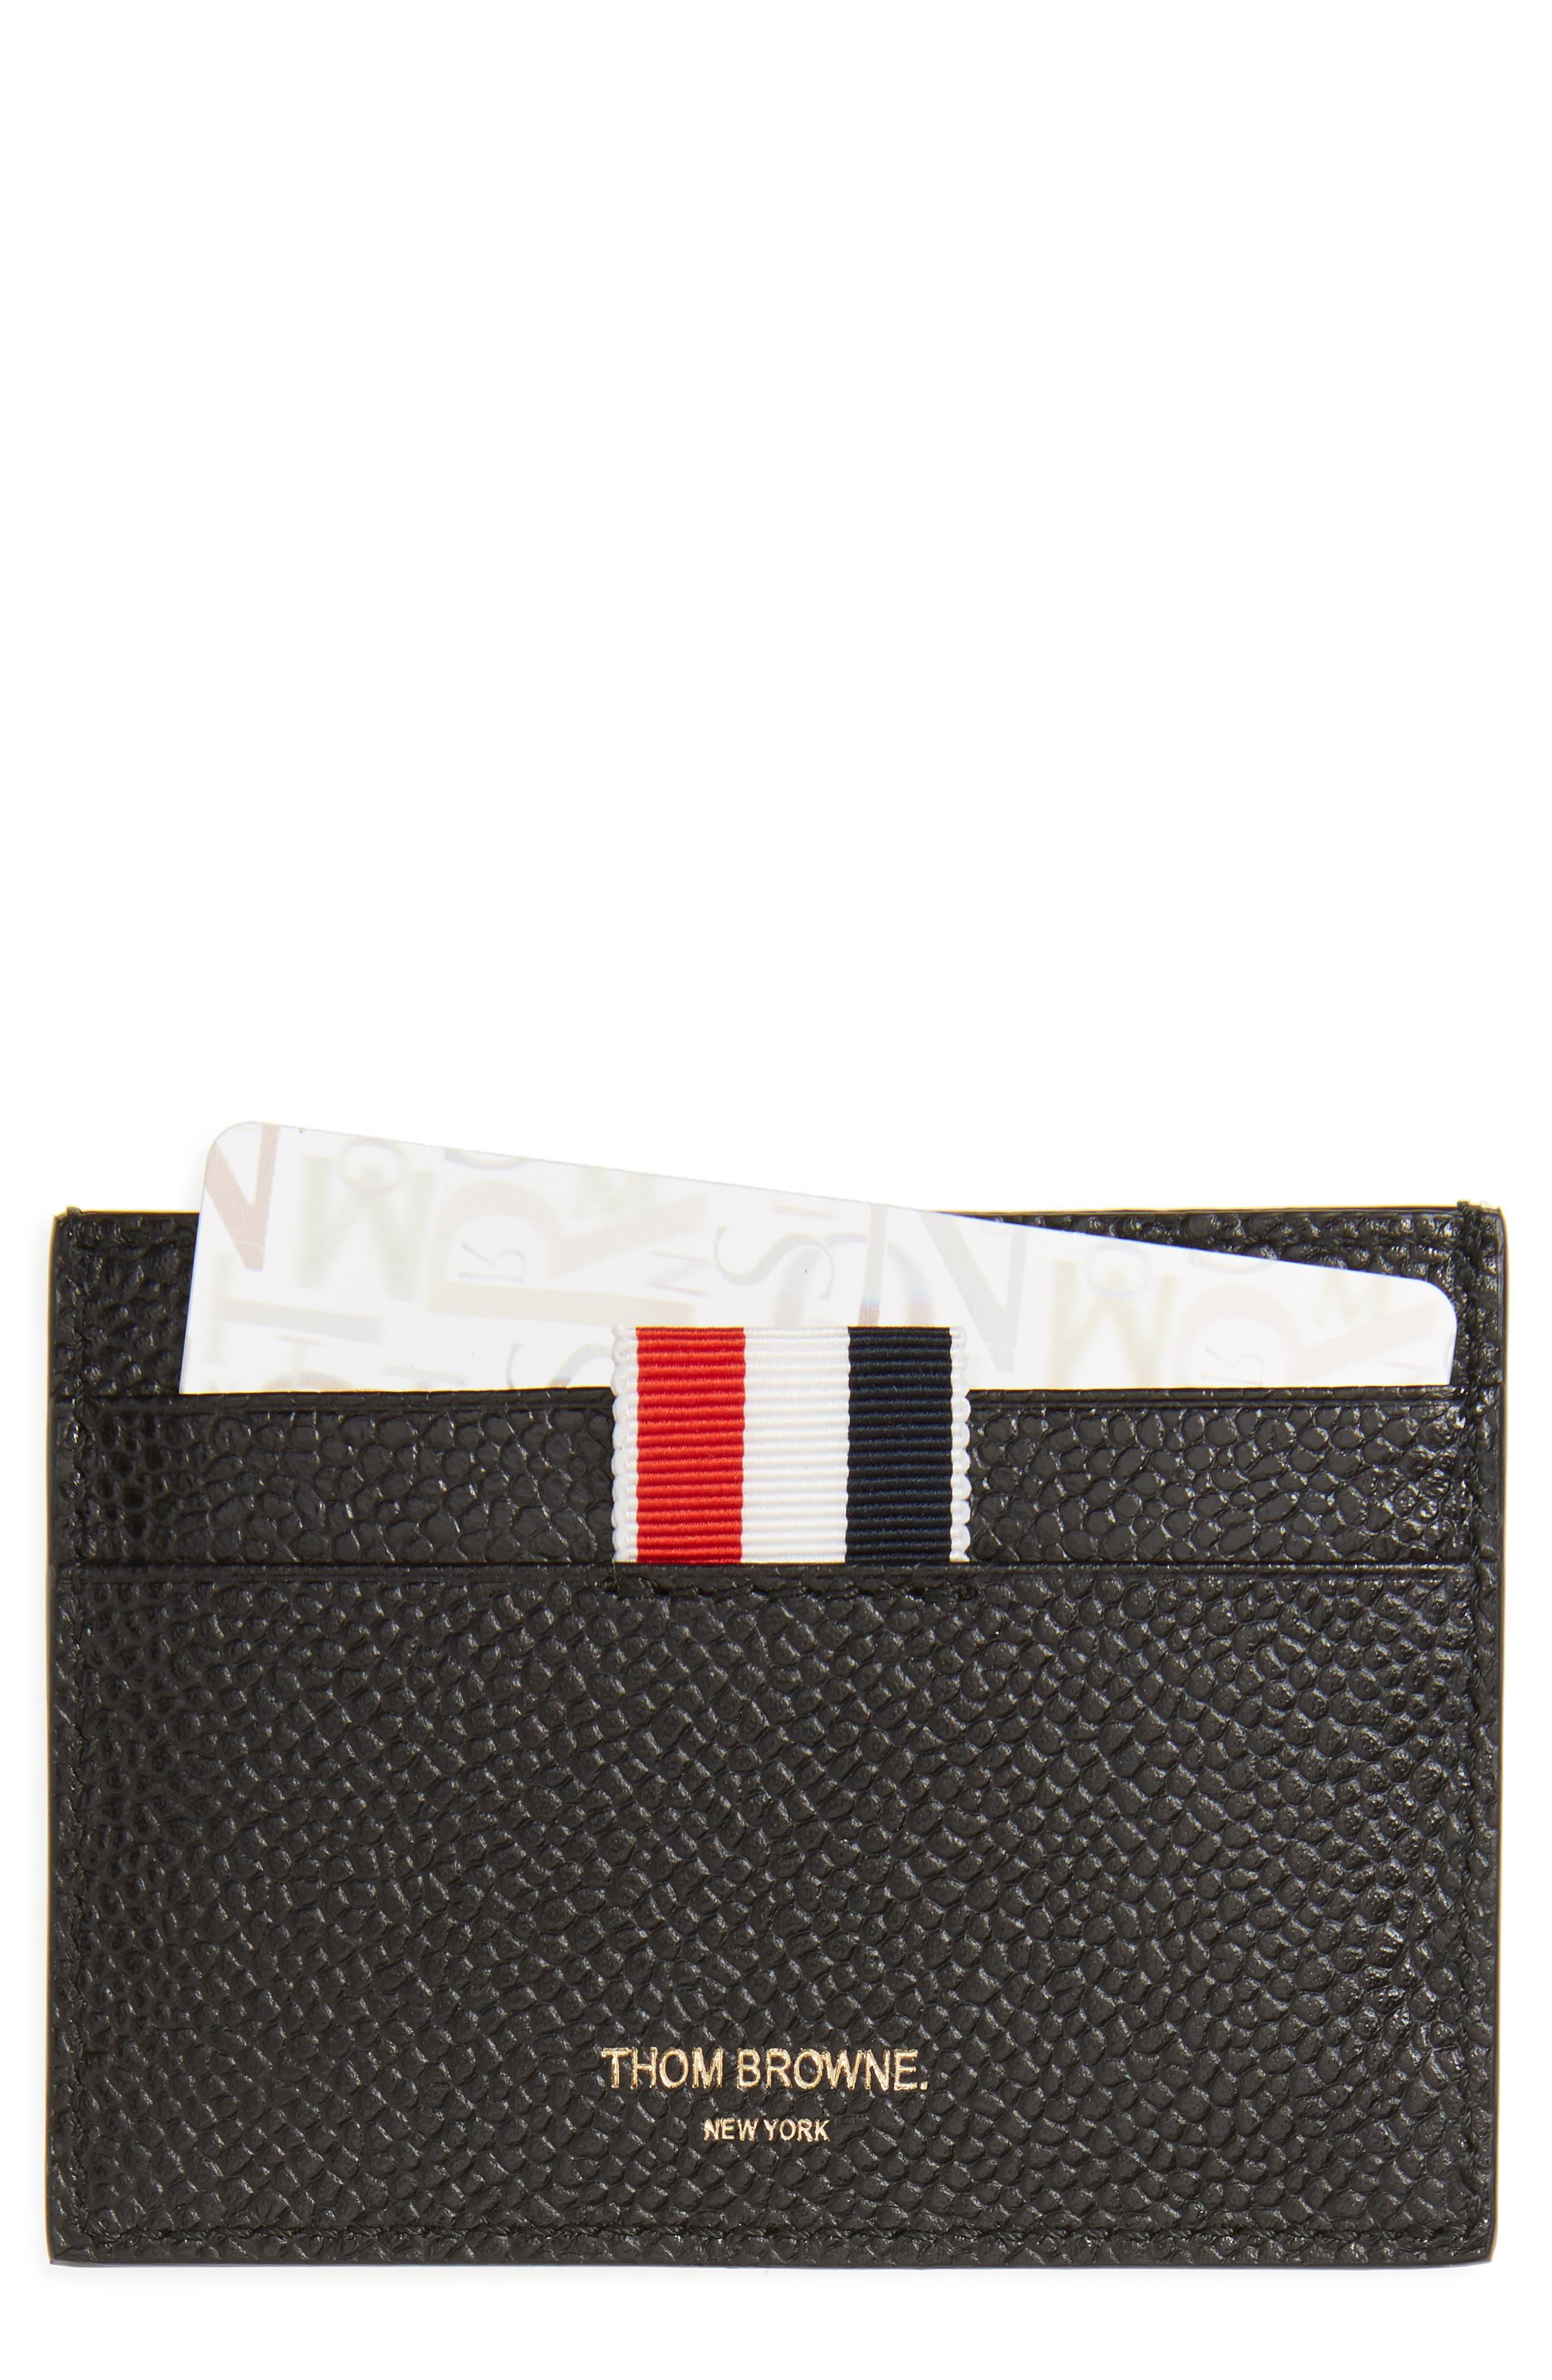 Thom Browne Diagonal Stripe Leather Card Case